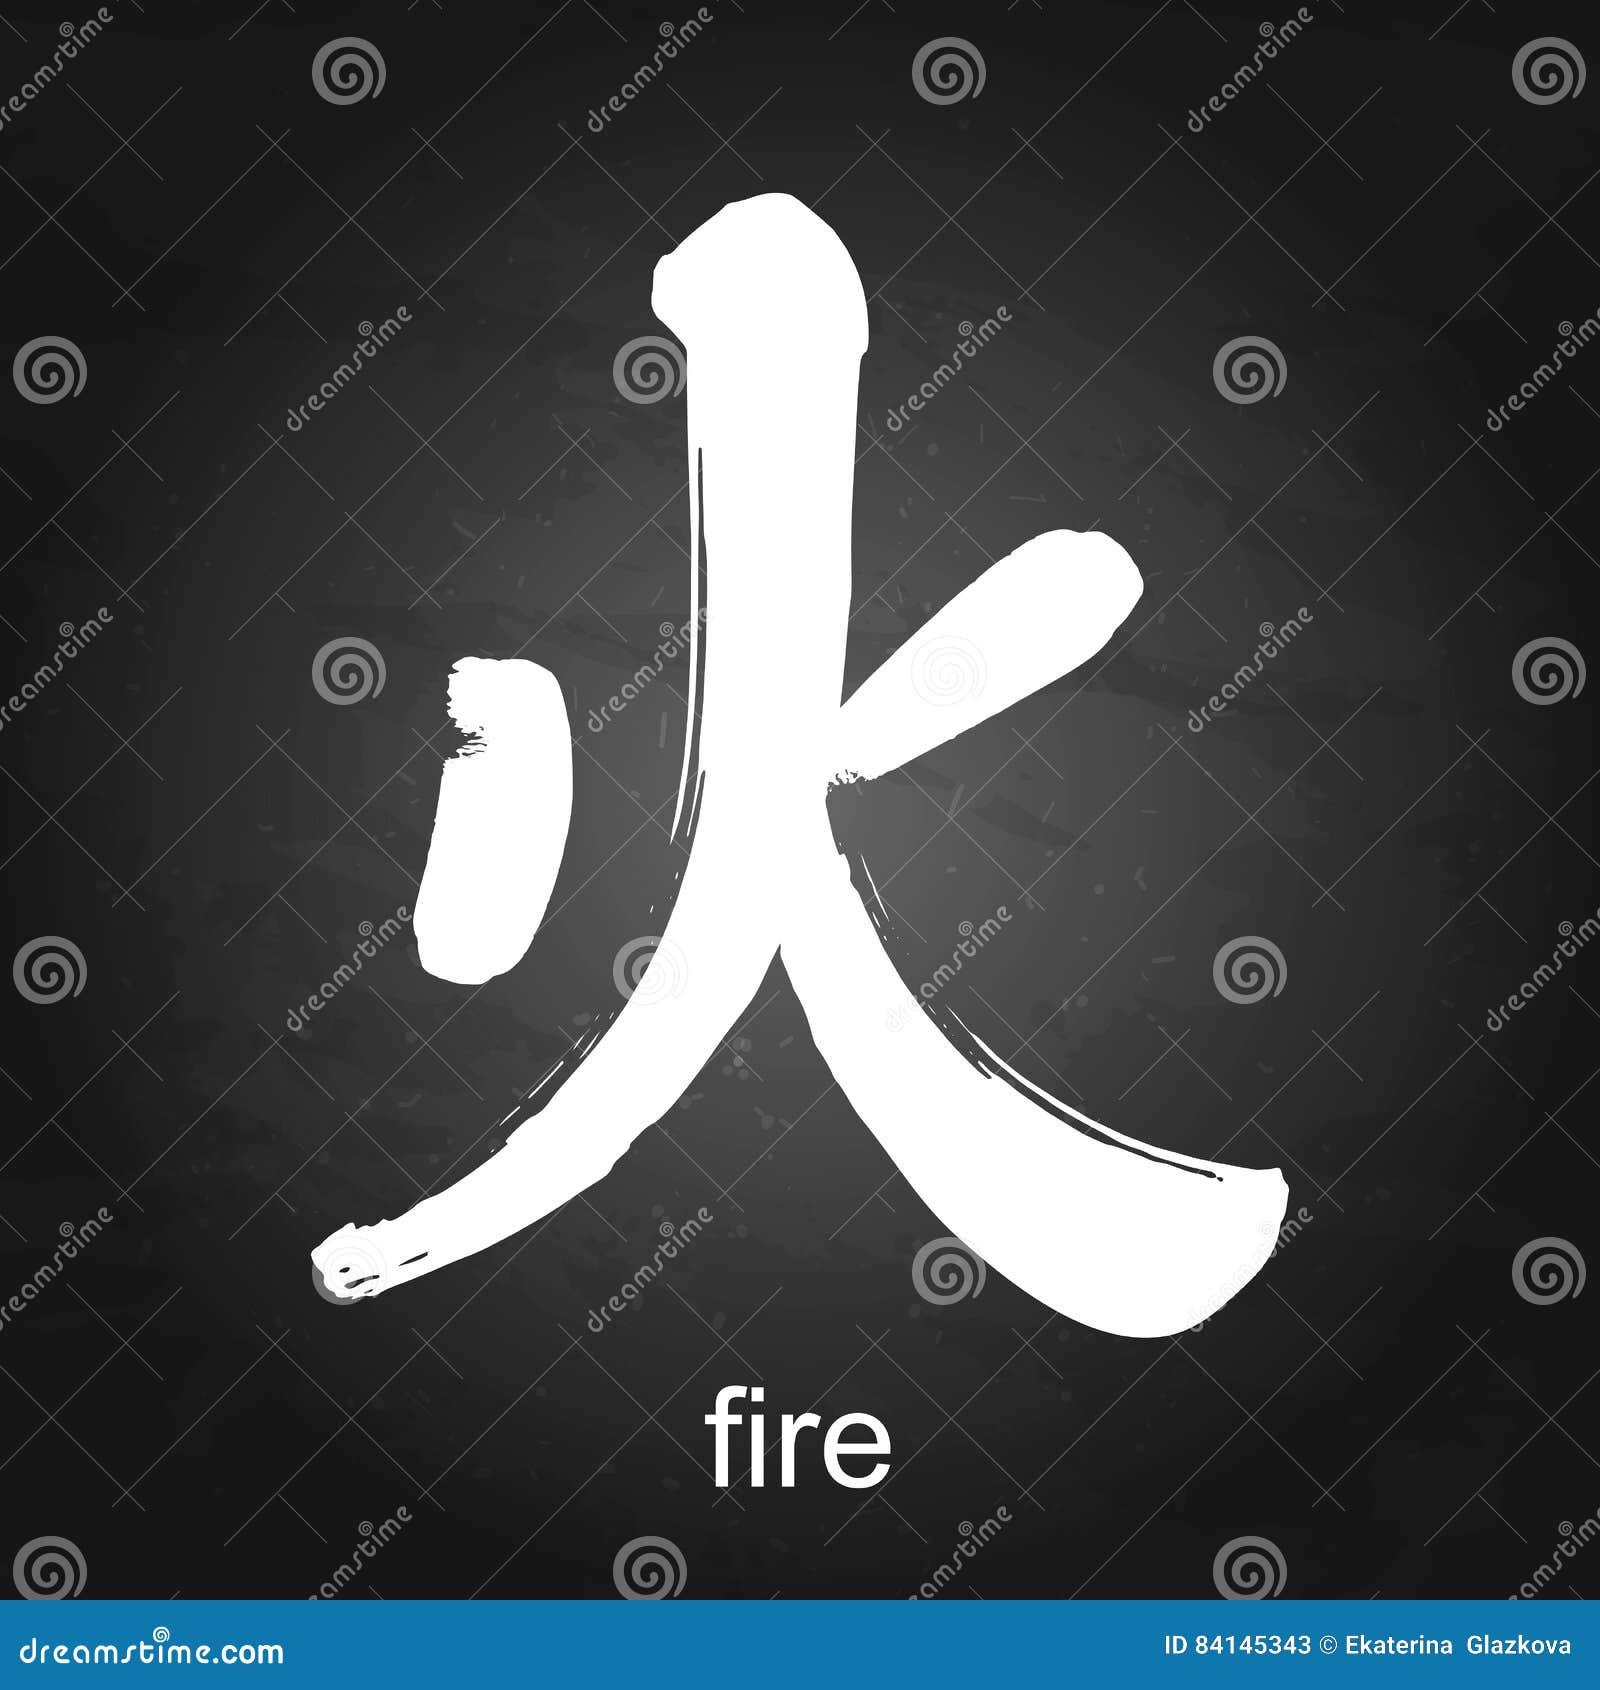 Kanji Hieroglyph Fire Stock Vector Illustration Of Alphabet 84145343